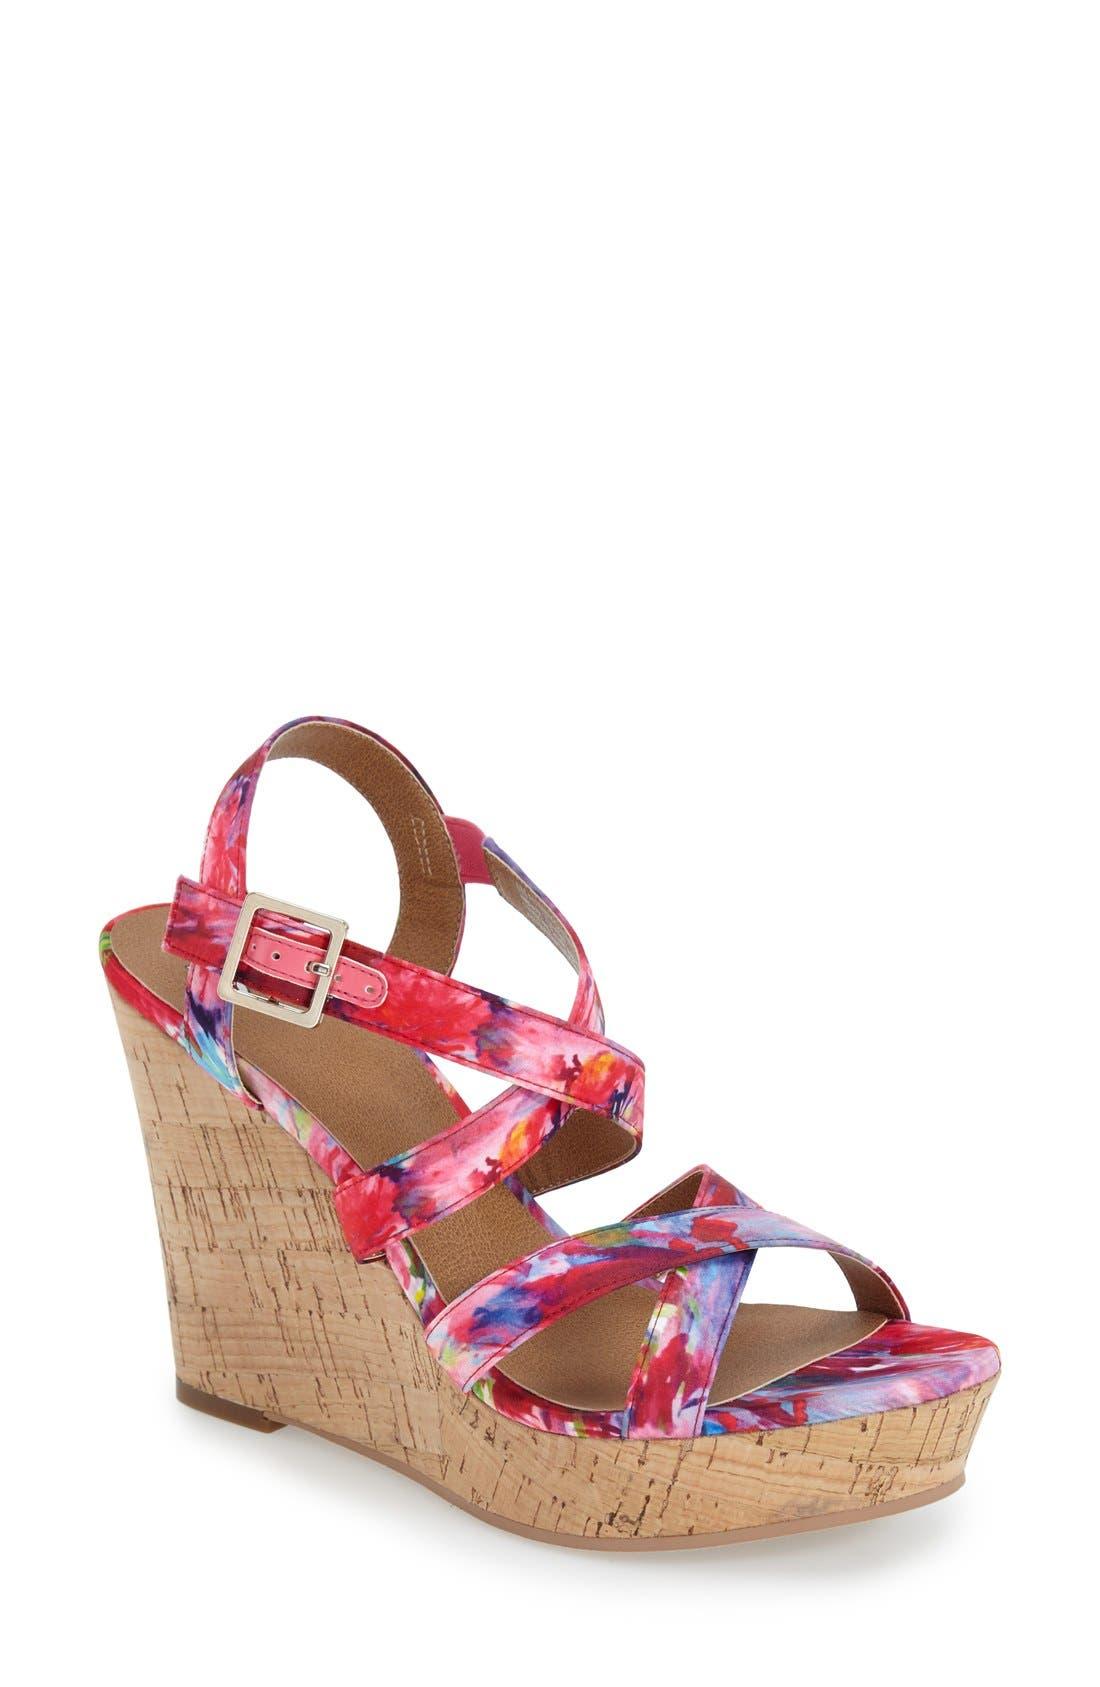 'Summers' Wedge Sandal,                             Main thumbnail 7, color,